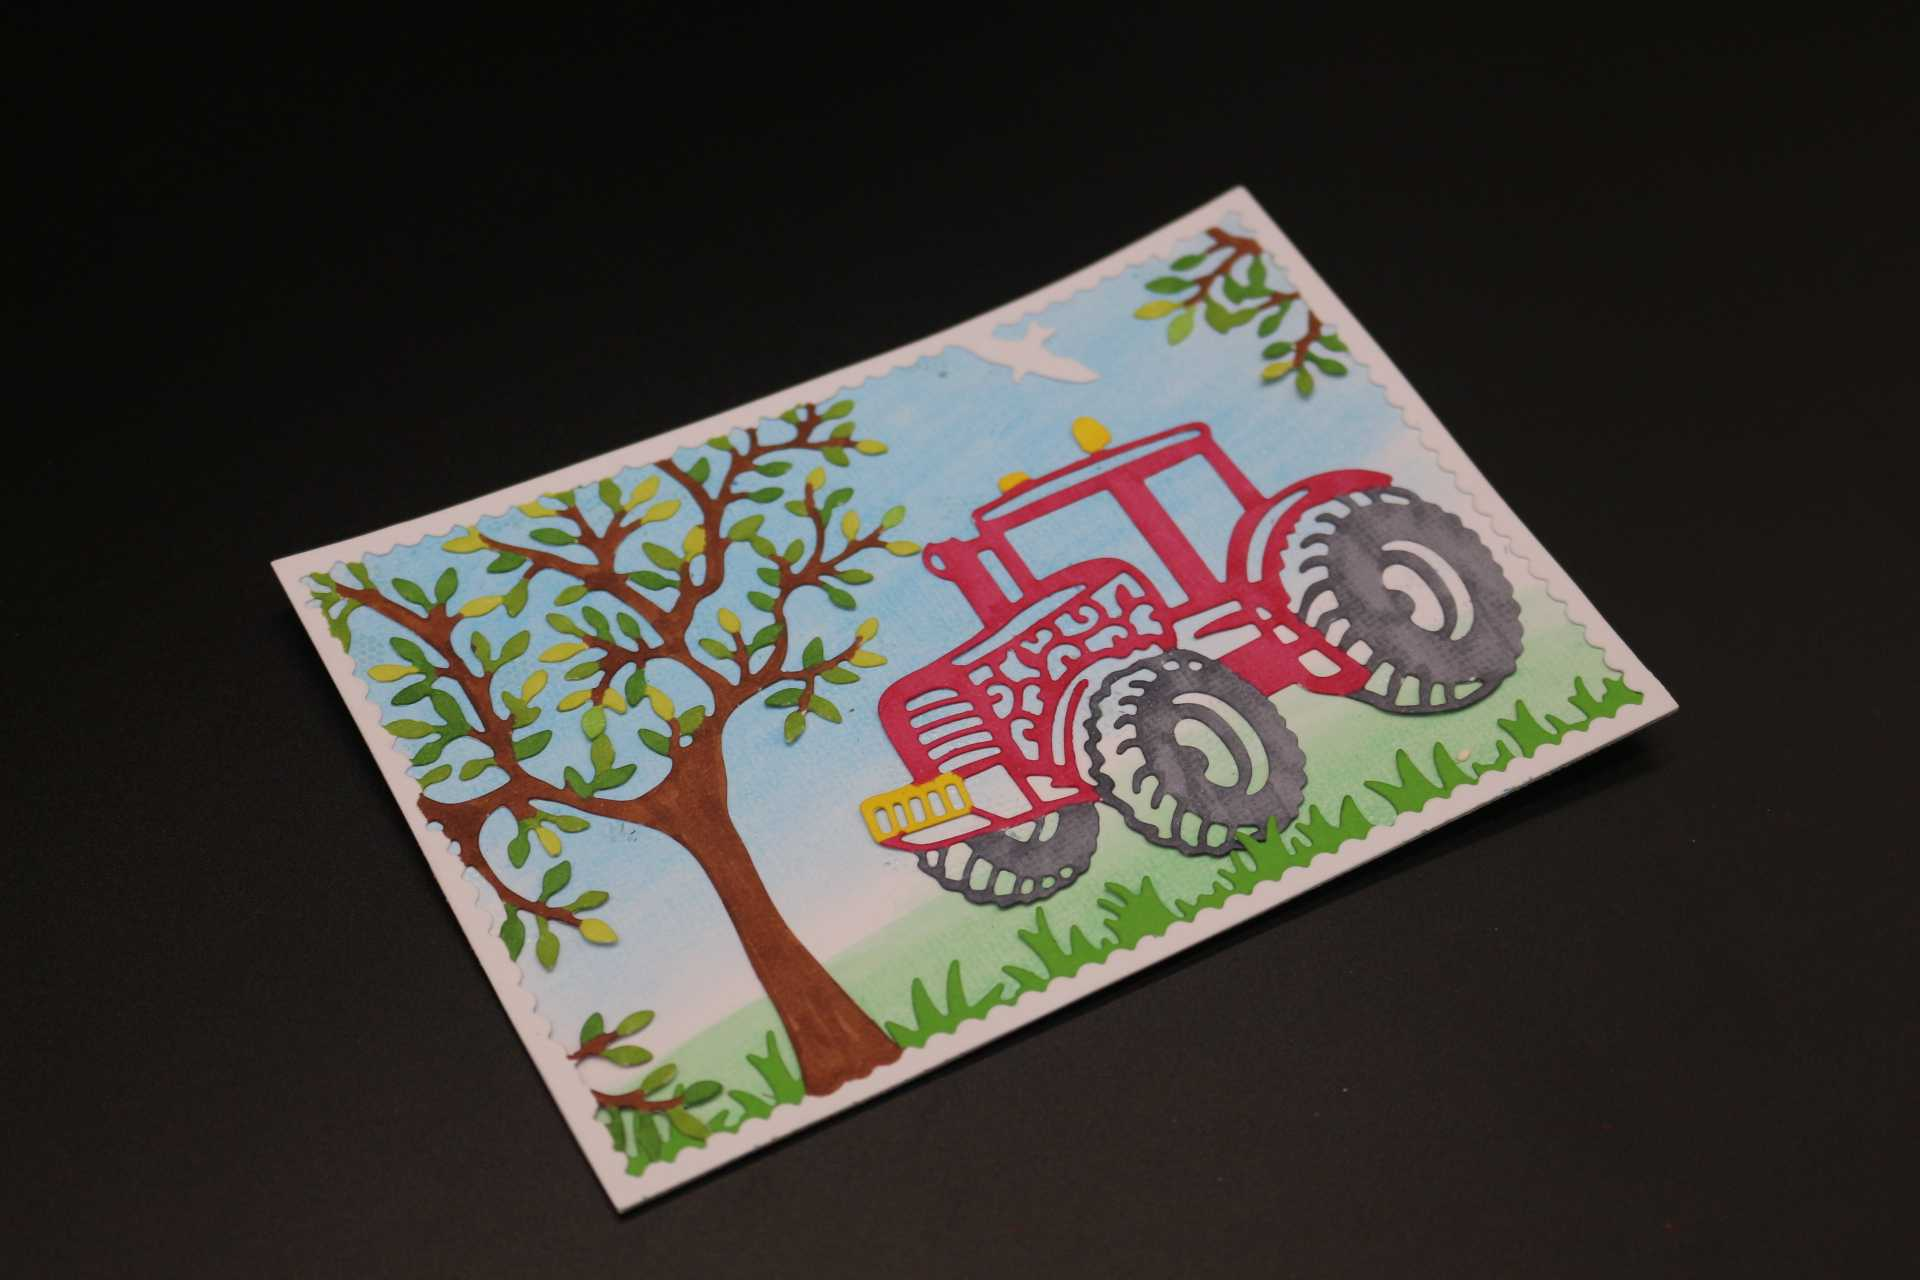 1*Car Tree Metal Cutting Dies Stencil DIY Scrapbooking Card Making Craft